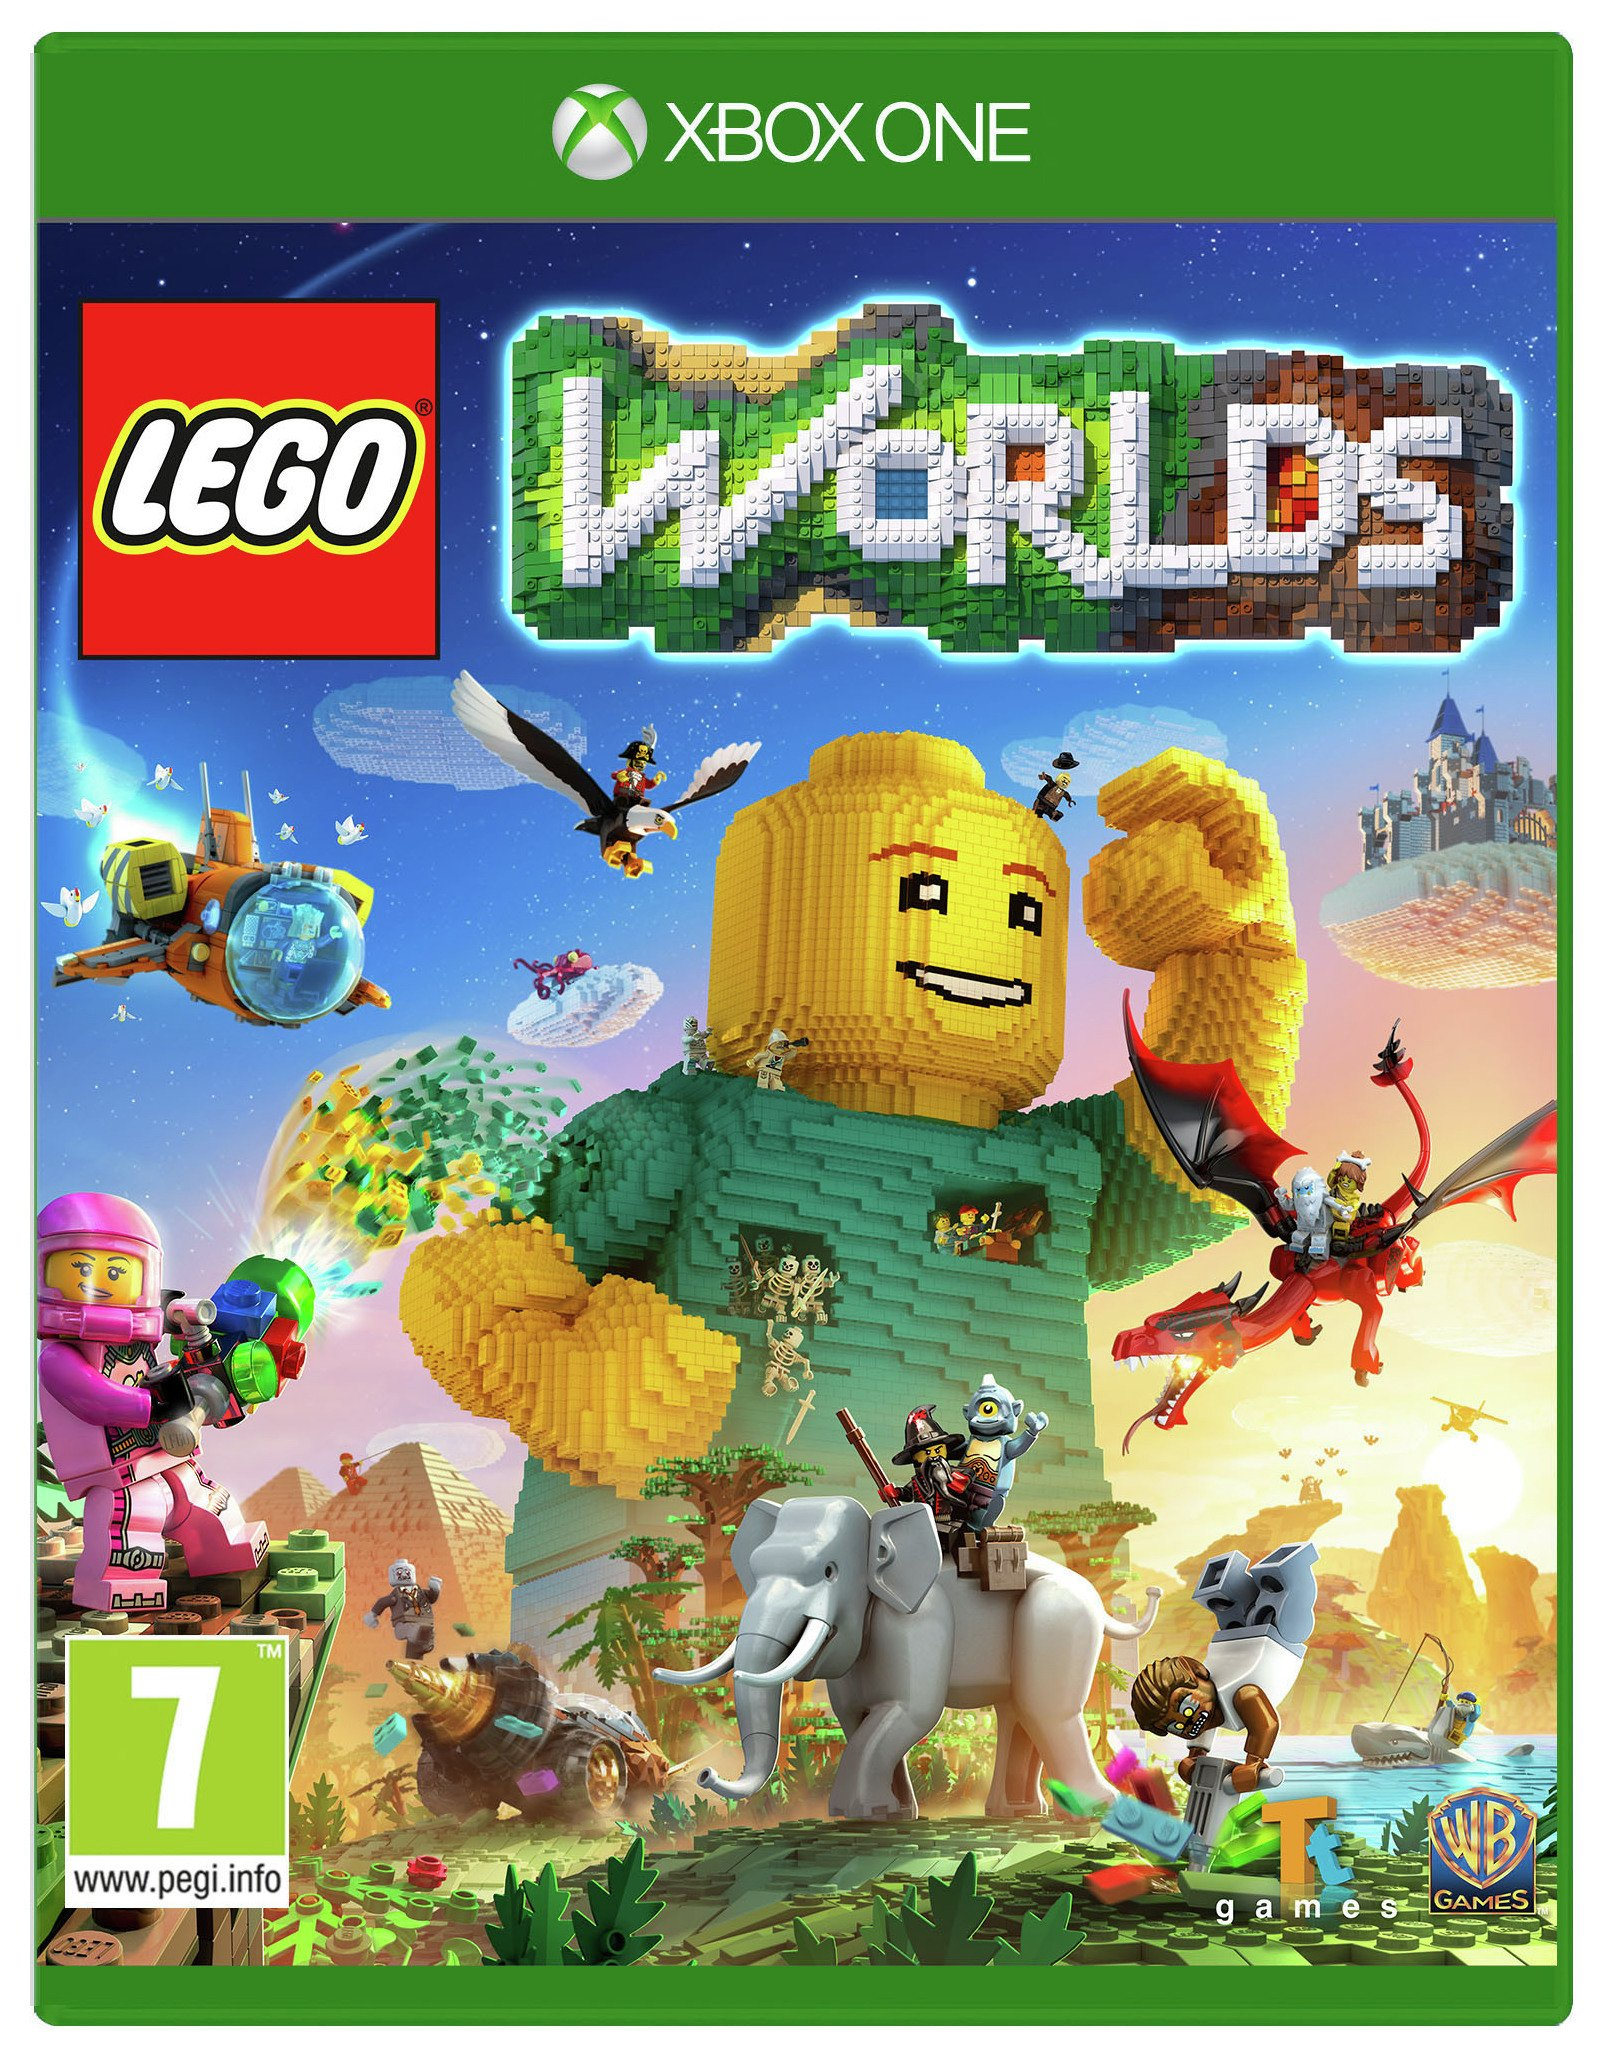 Buy Lego Worlds Xbox One Game | Xbox One games | Argos